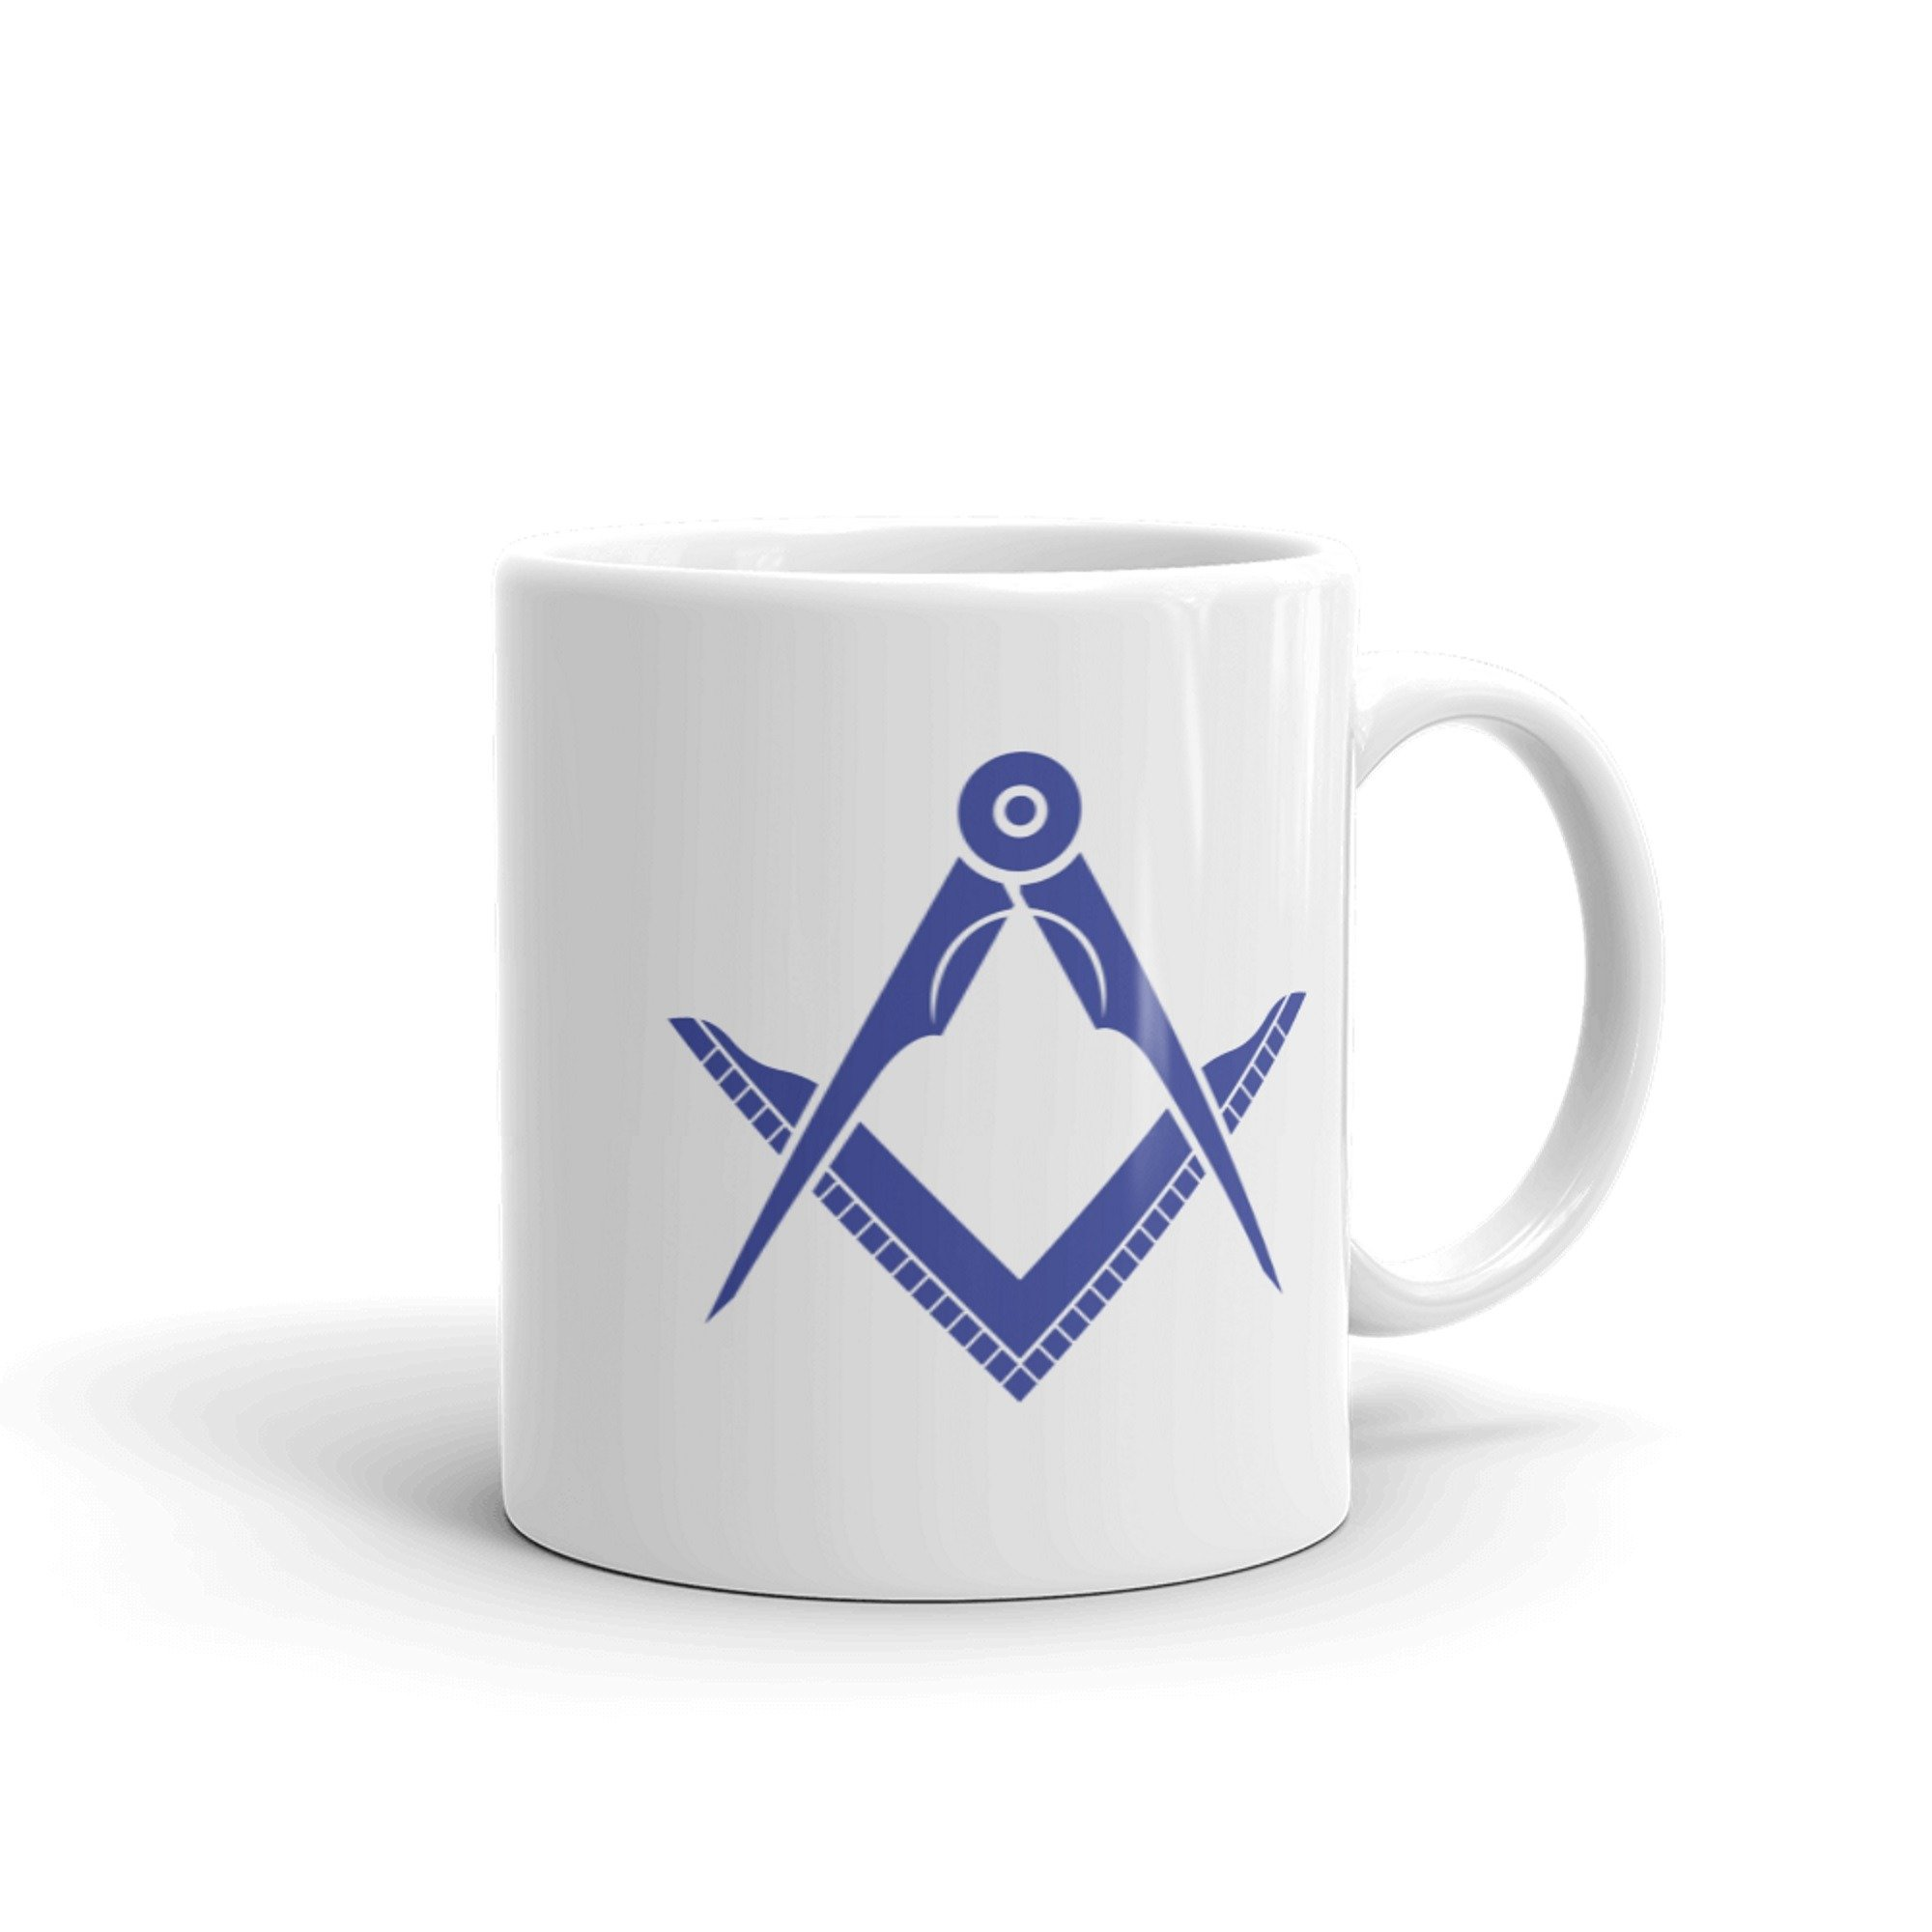 Masonic mug - Handle right